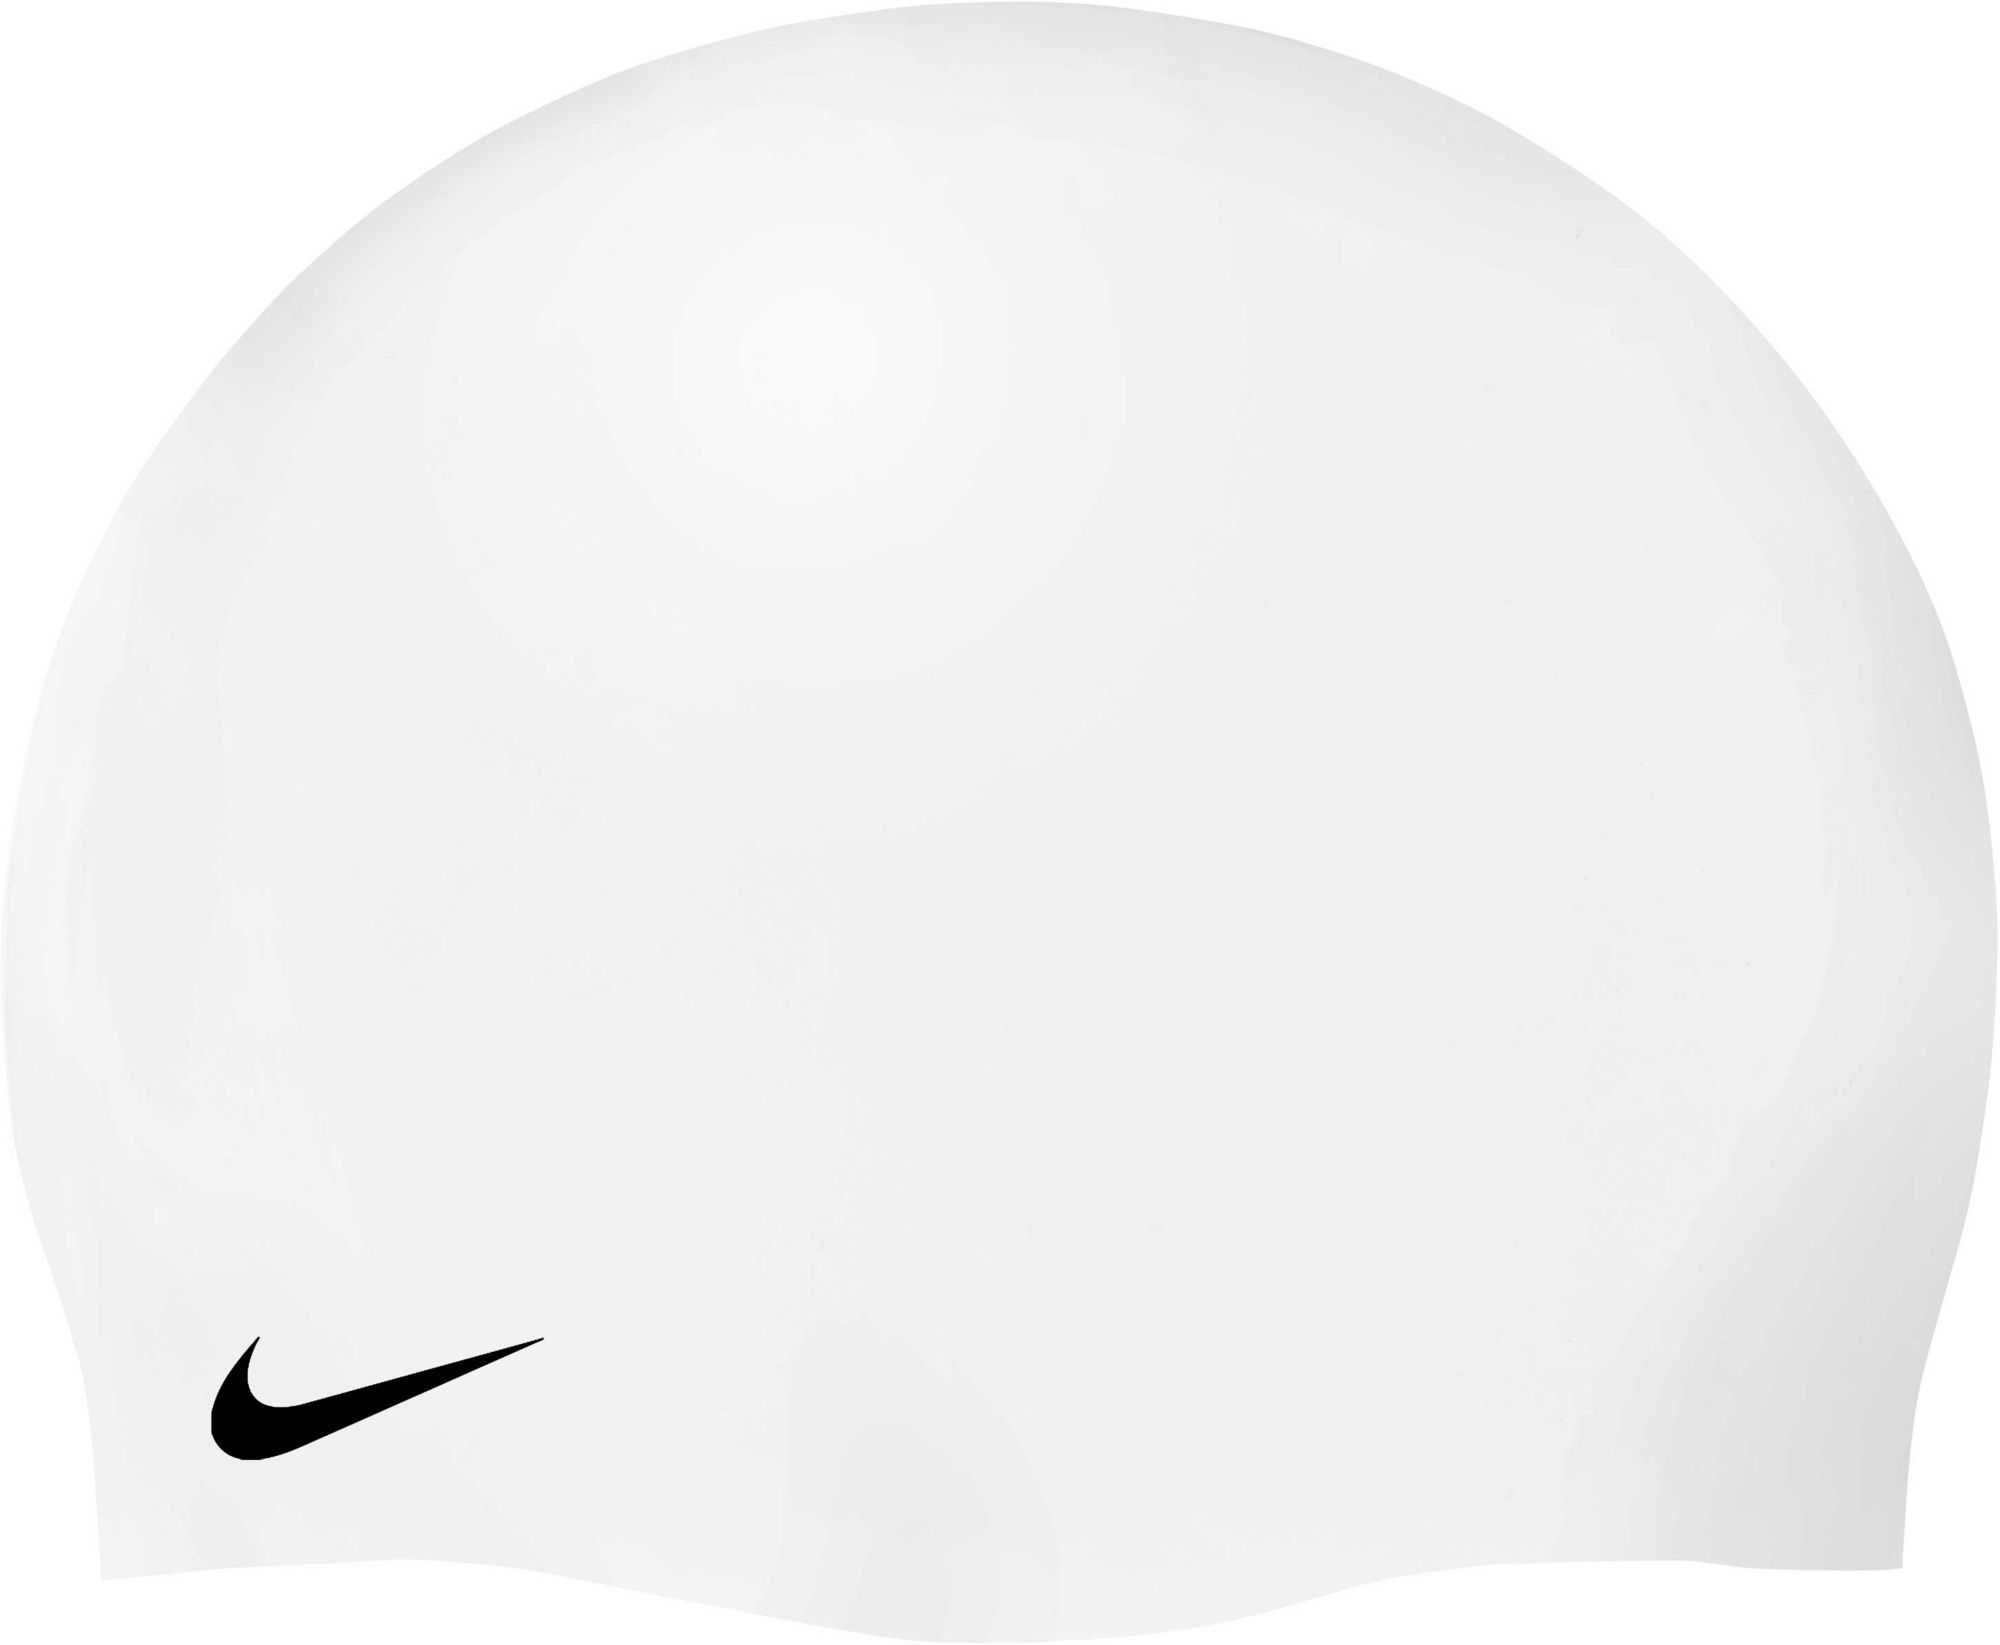 f981f4b1646 Nike Flat Latex Swim Cap | Products | Nike flats, Swim caps, Nike